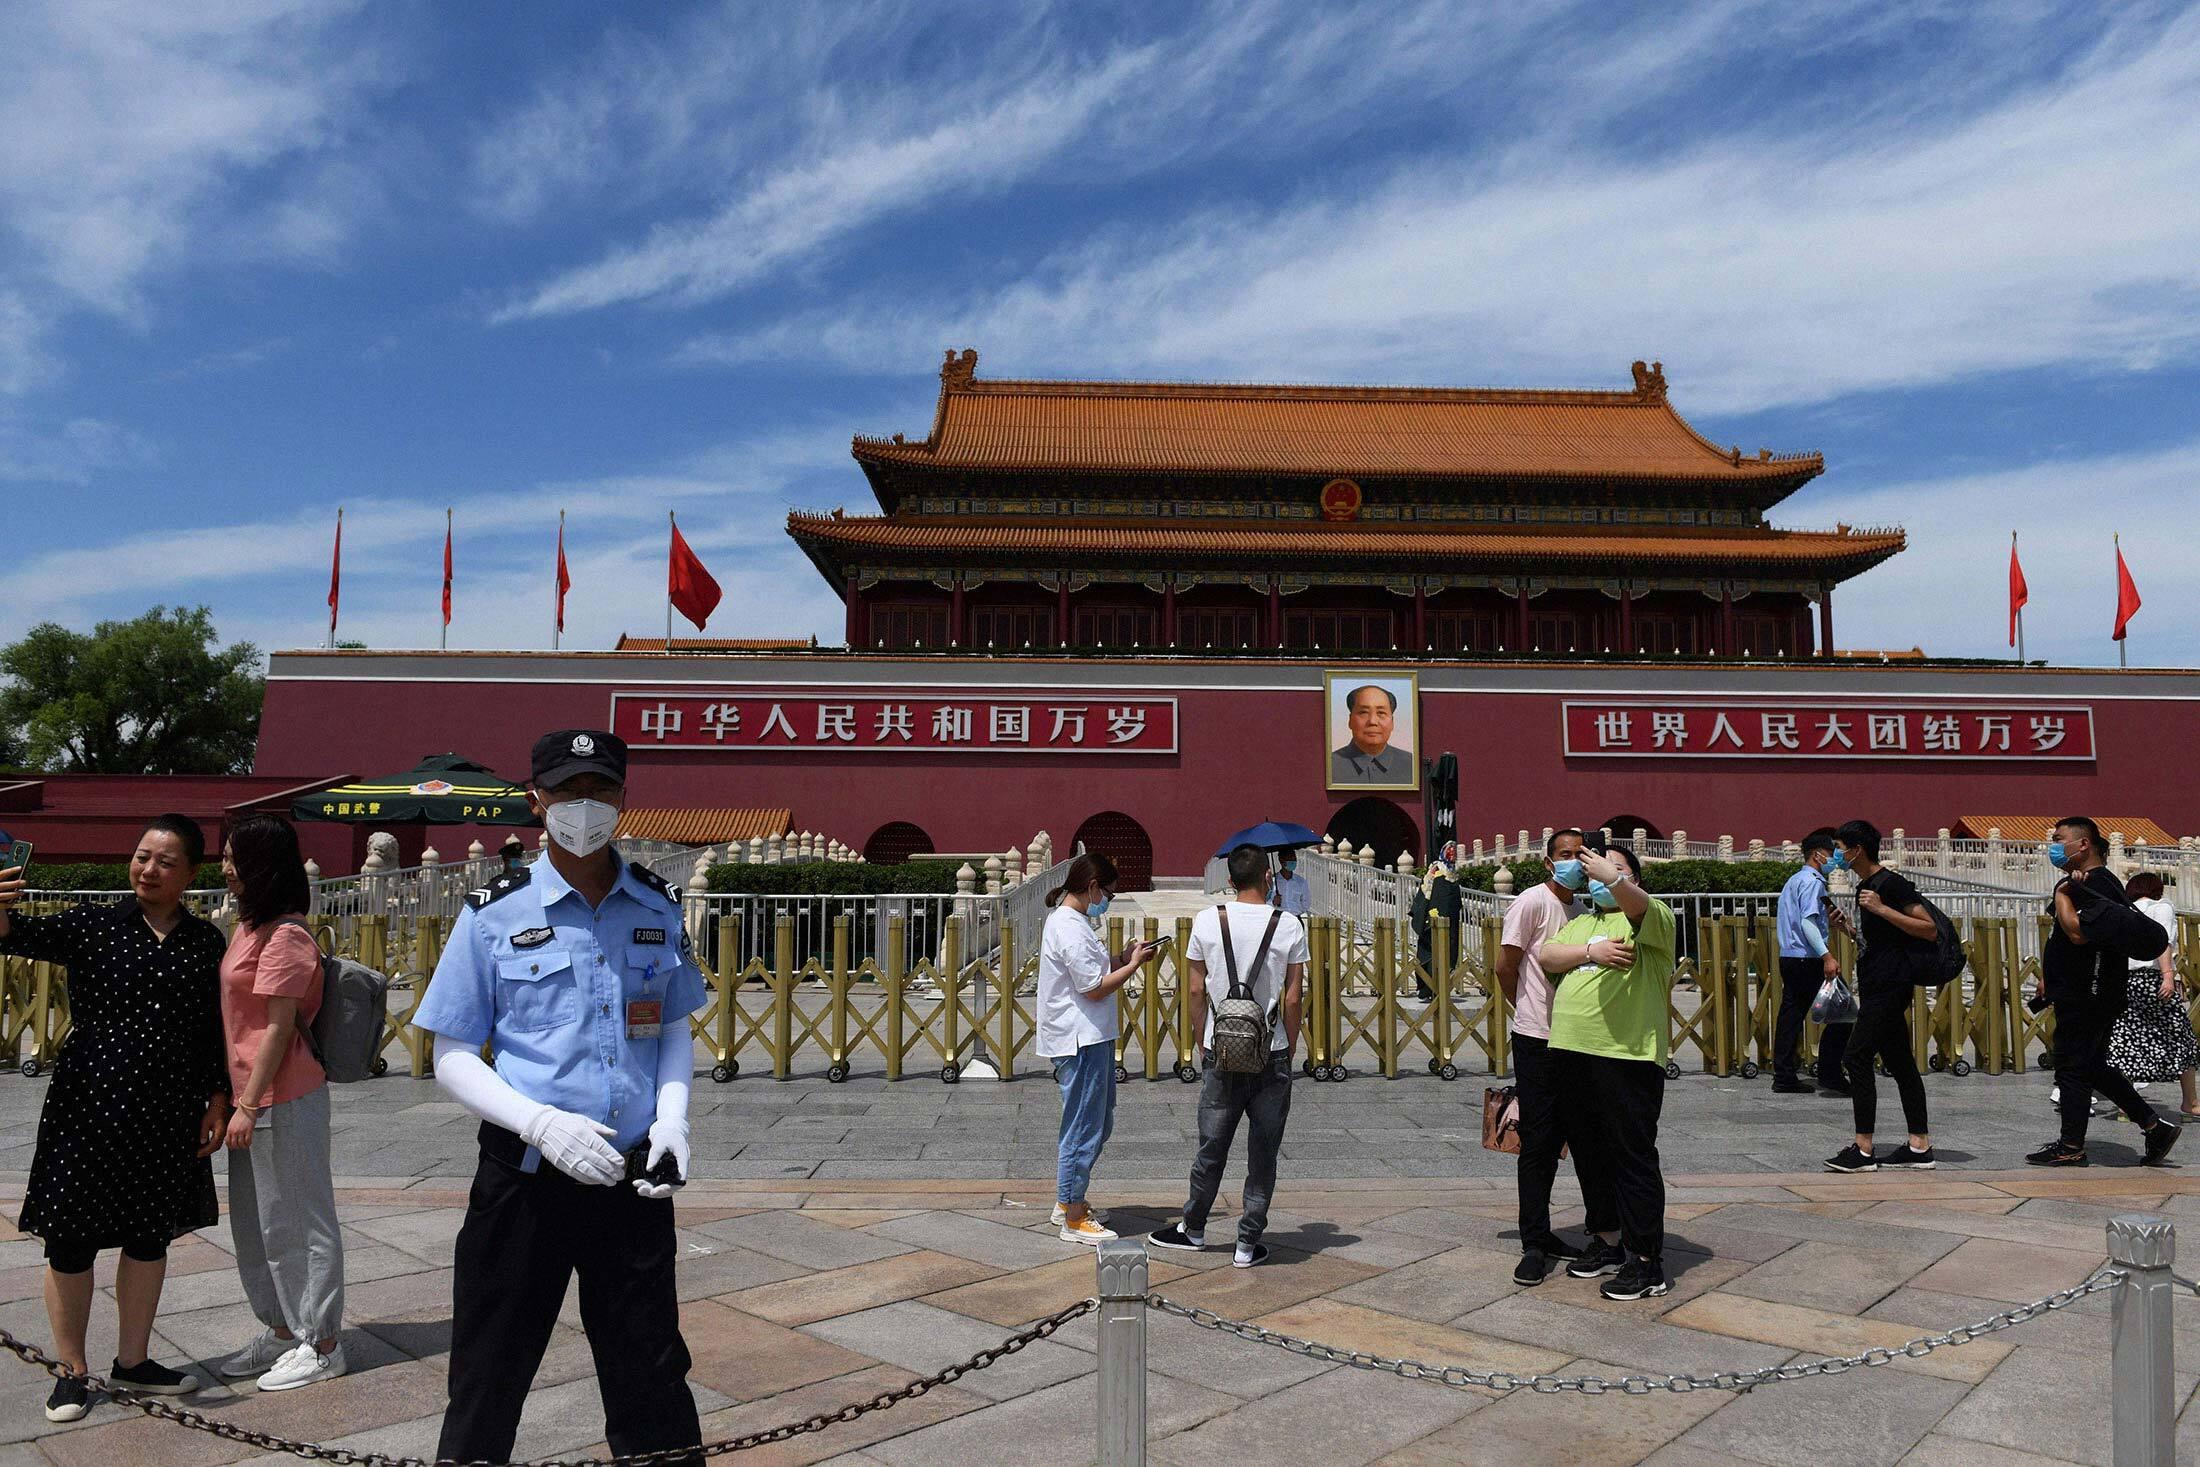 Tiananmen Gate,Beijing on May 20, 2020.